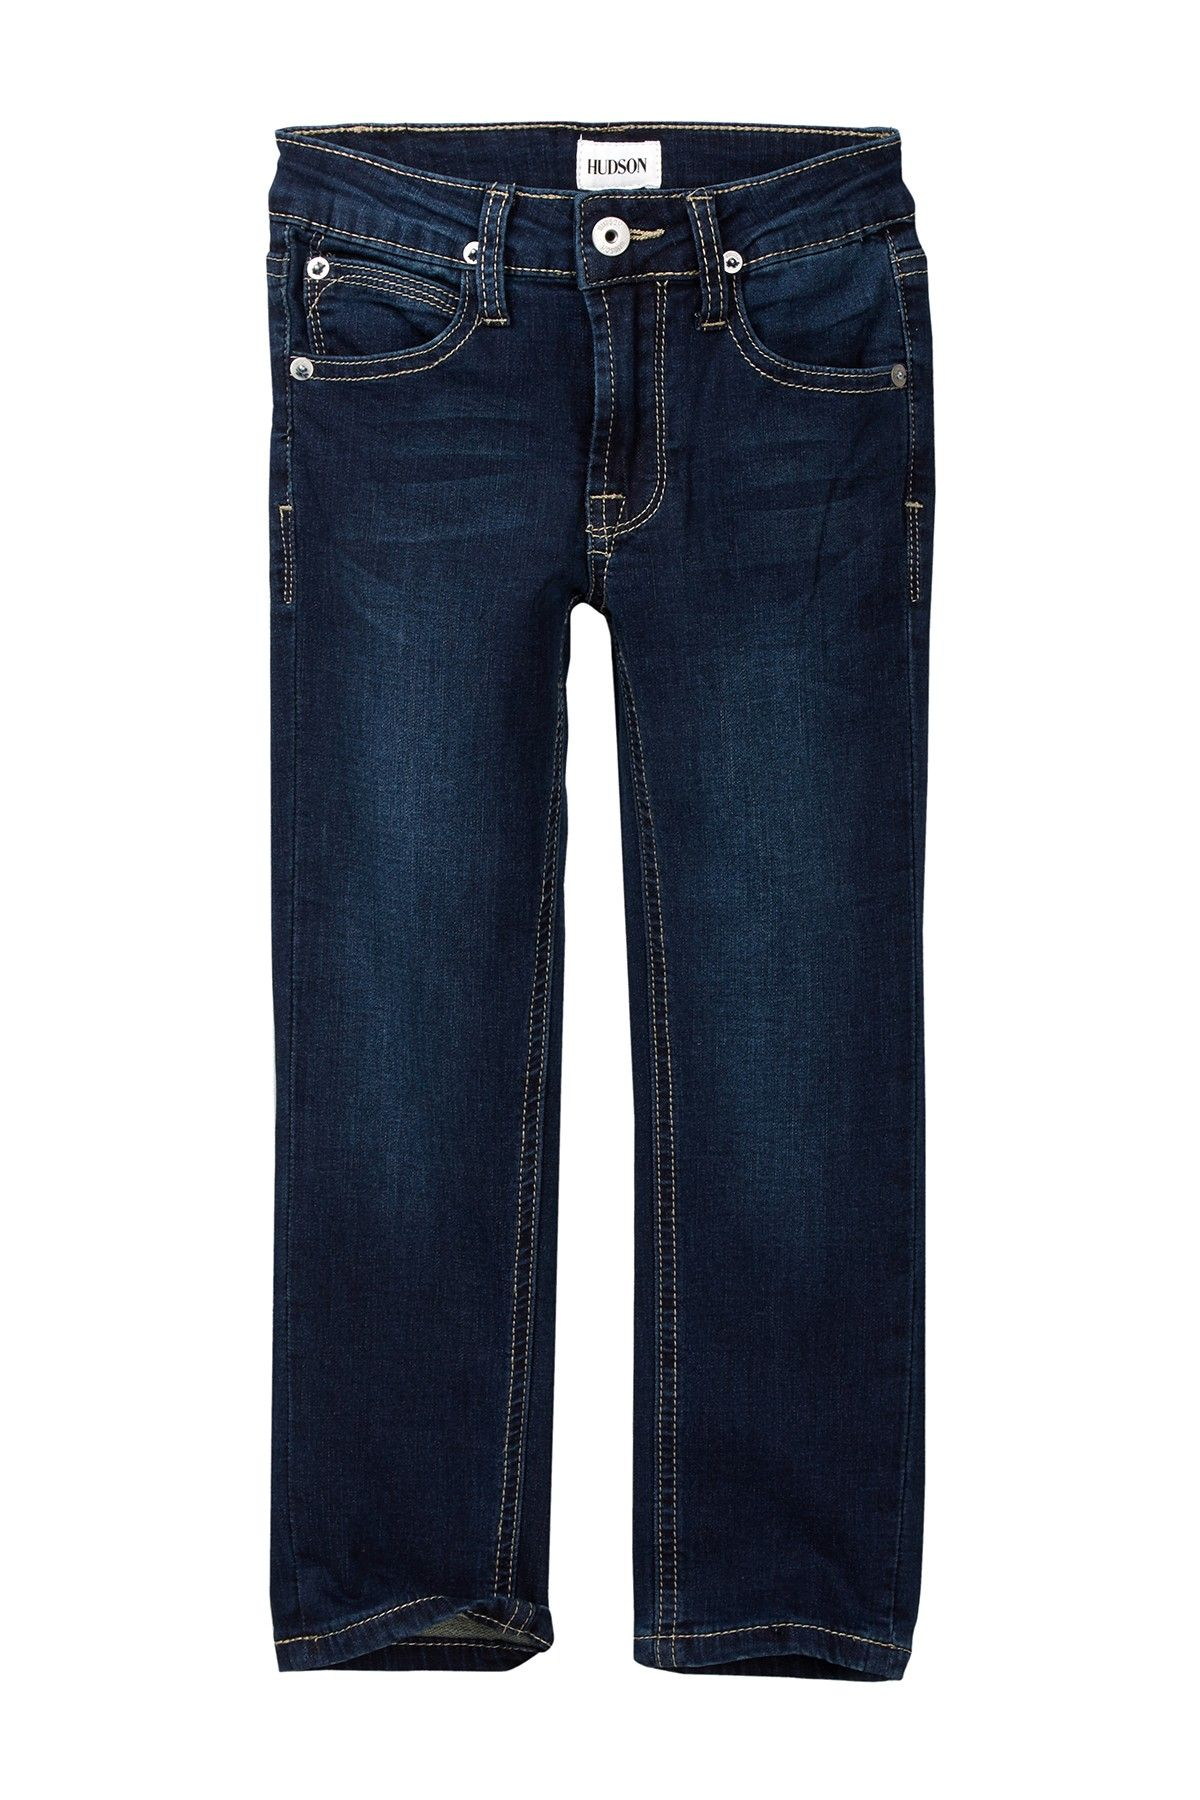 Parker Straight Knit Denim Jean (Toddler & Little Boys)